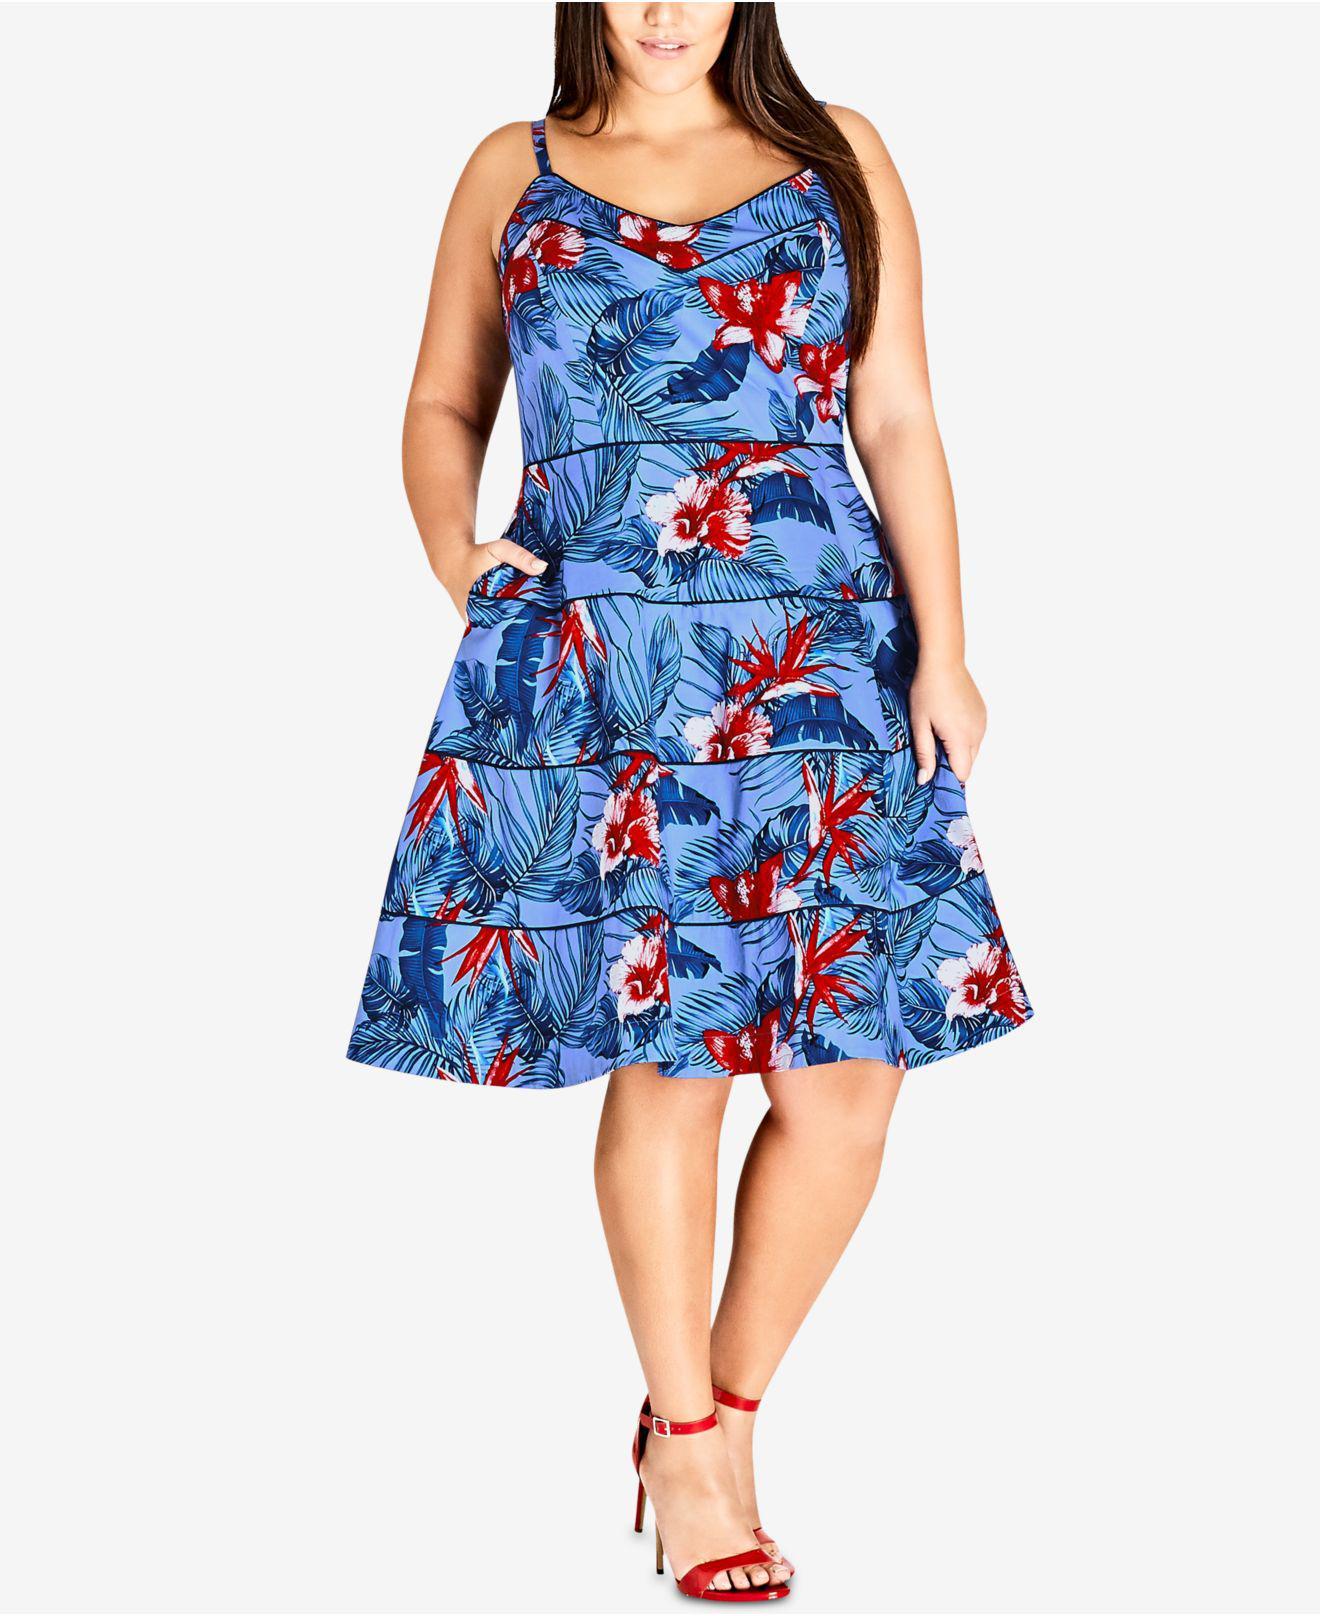 b8a9ea78fd1 City Chic. Women s Blue Trendy Plus Size Tropical-print Fit   Flare Dress